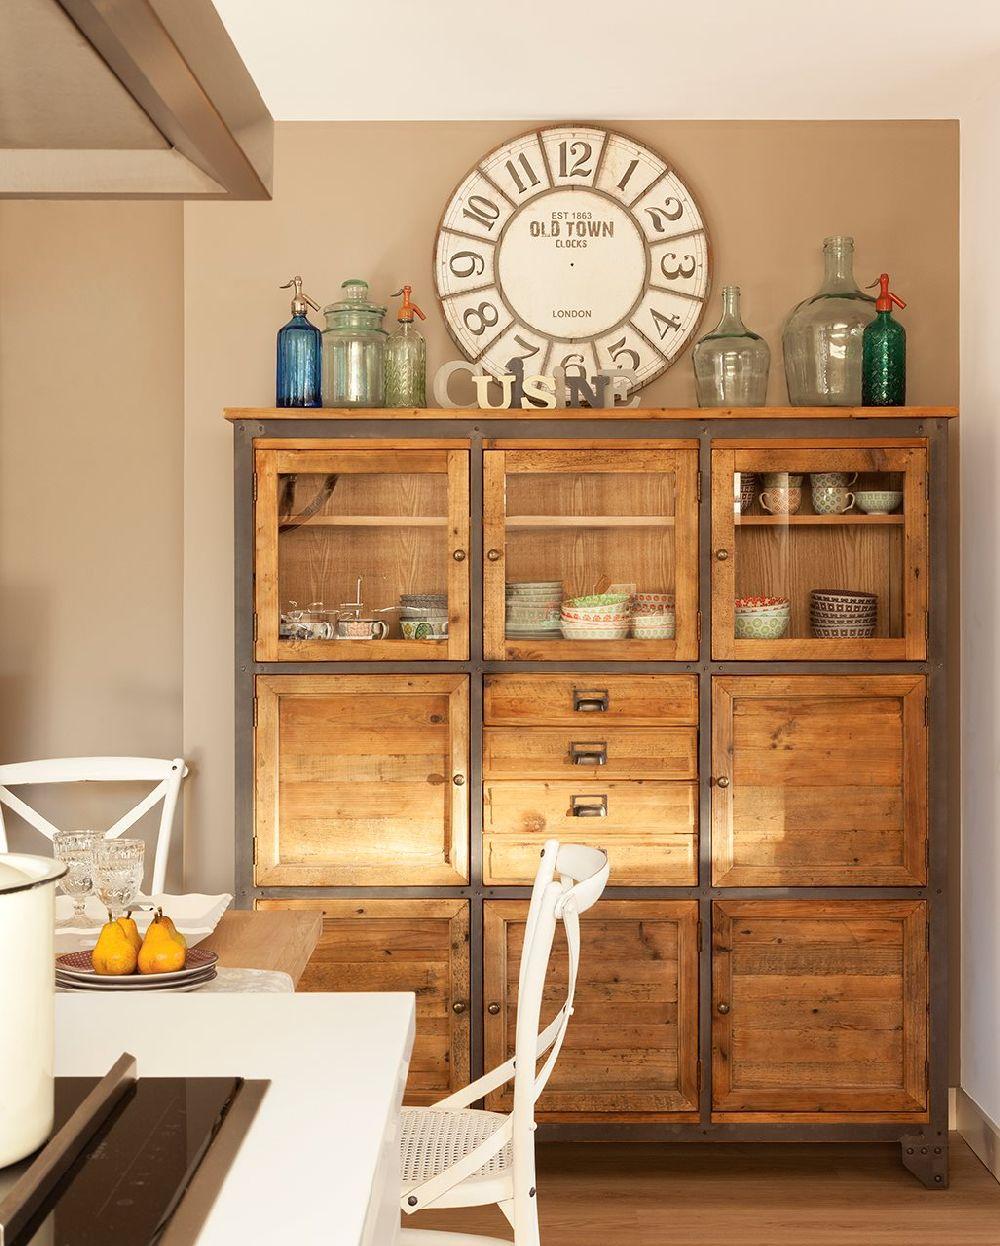 adelaparvu.com despre apartament cu camere separate de usi glisante, designer Pia Capdevila, Foto ElMueble (3)